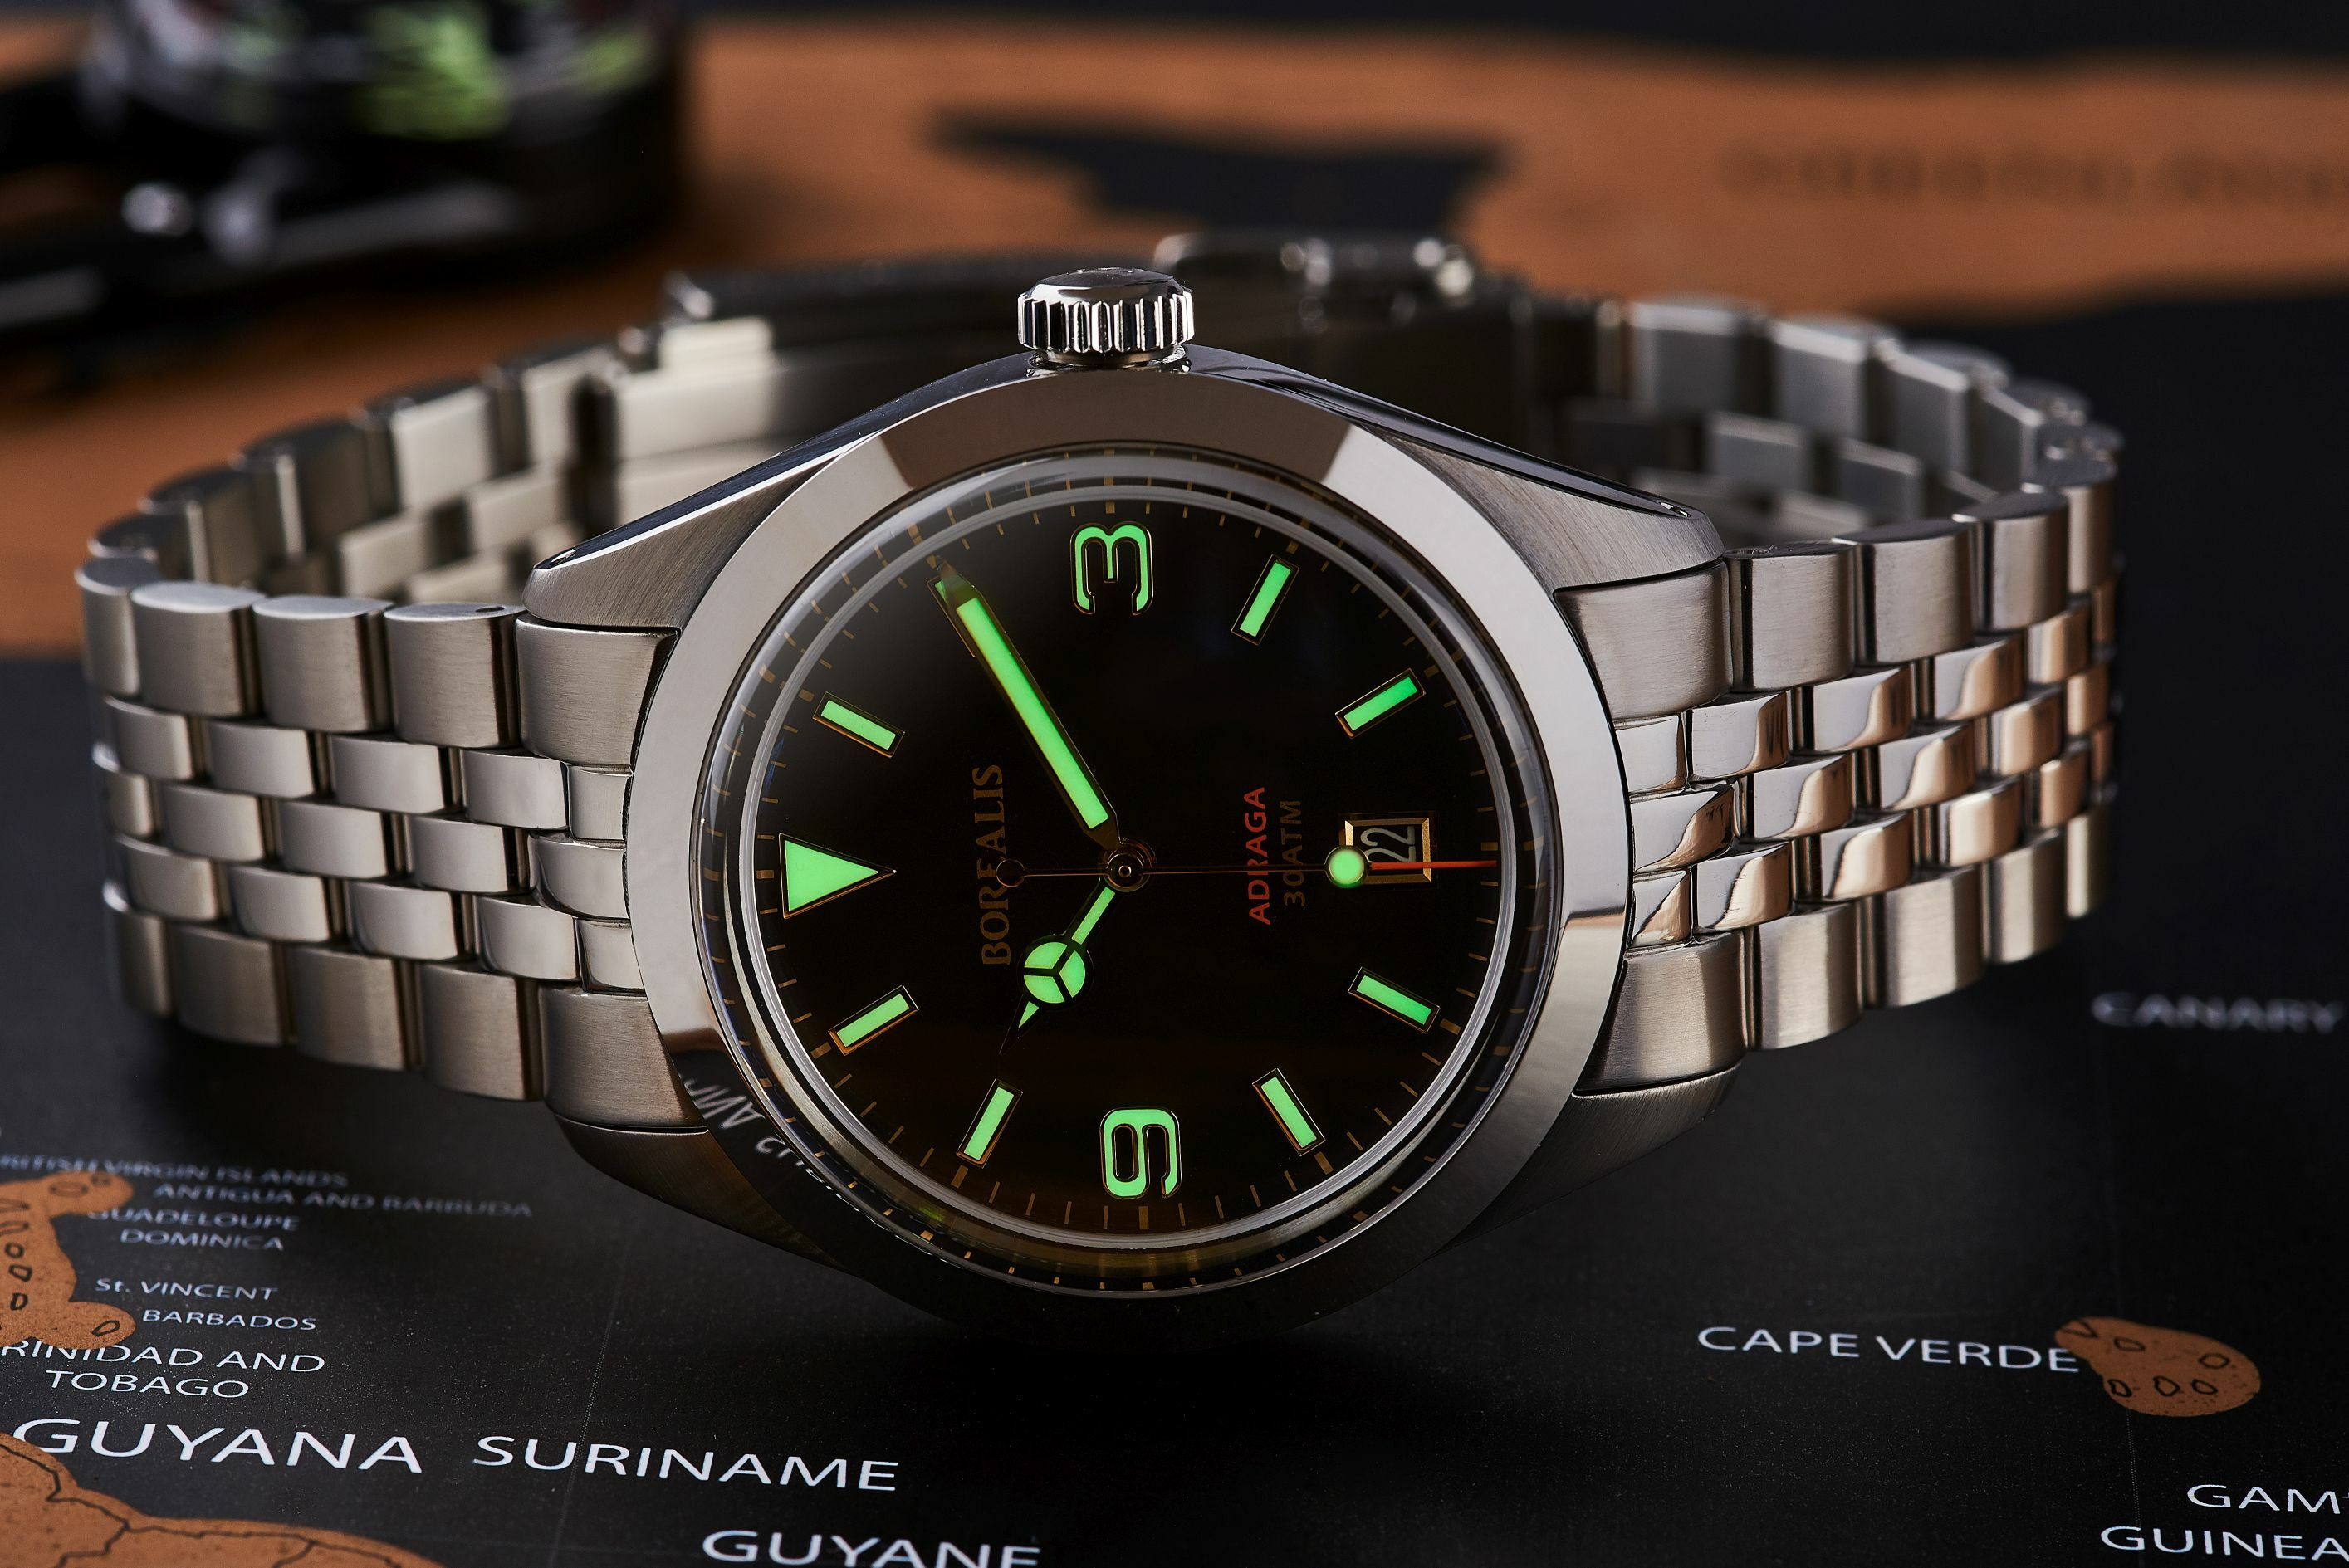 Borealis Adraga Stainless Steel Miyota 9015 fumed brown dial Mercedes Hands Date Old Radium X1 lume